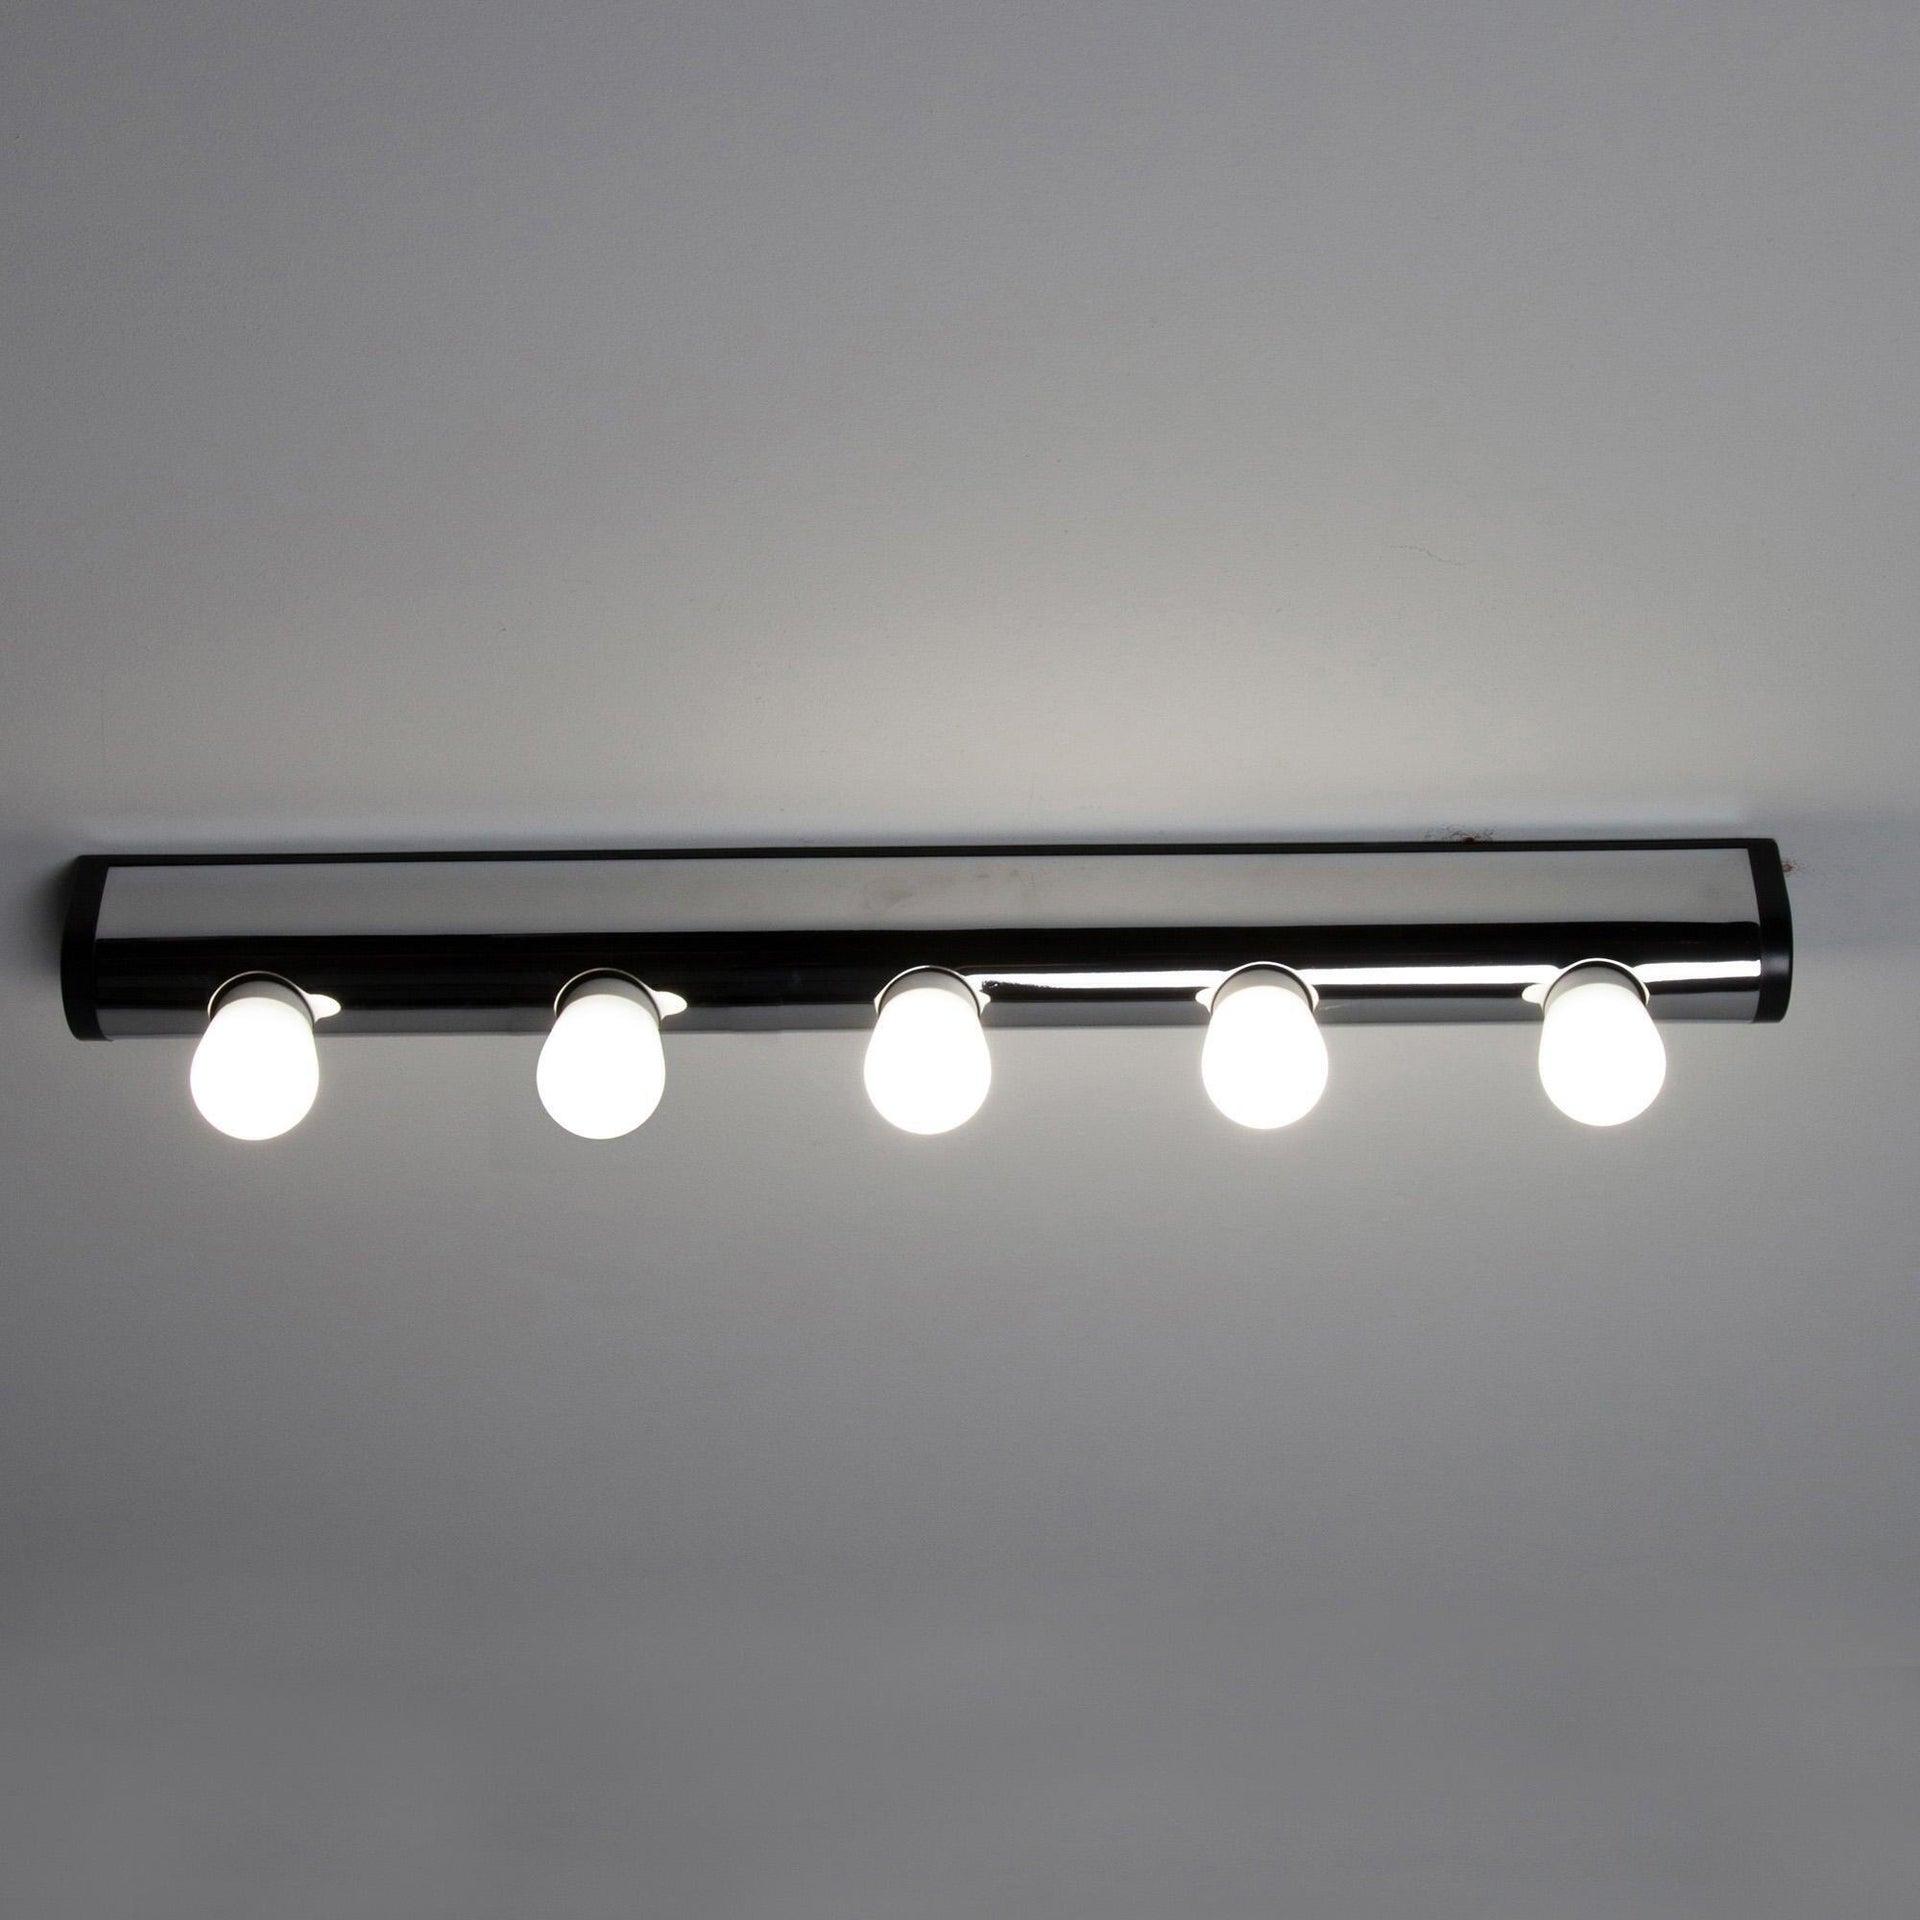 Applique moderno Liz cromo, in metallo, 60.4x5.5 cm, 5 luci INSPIRE - 3